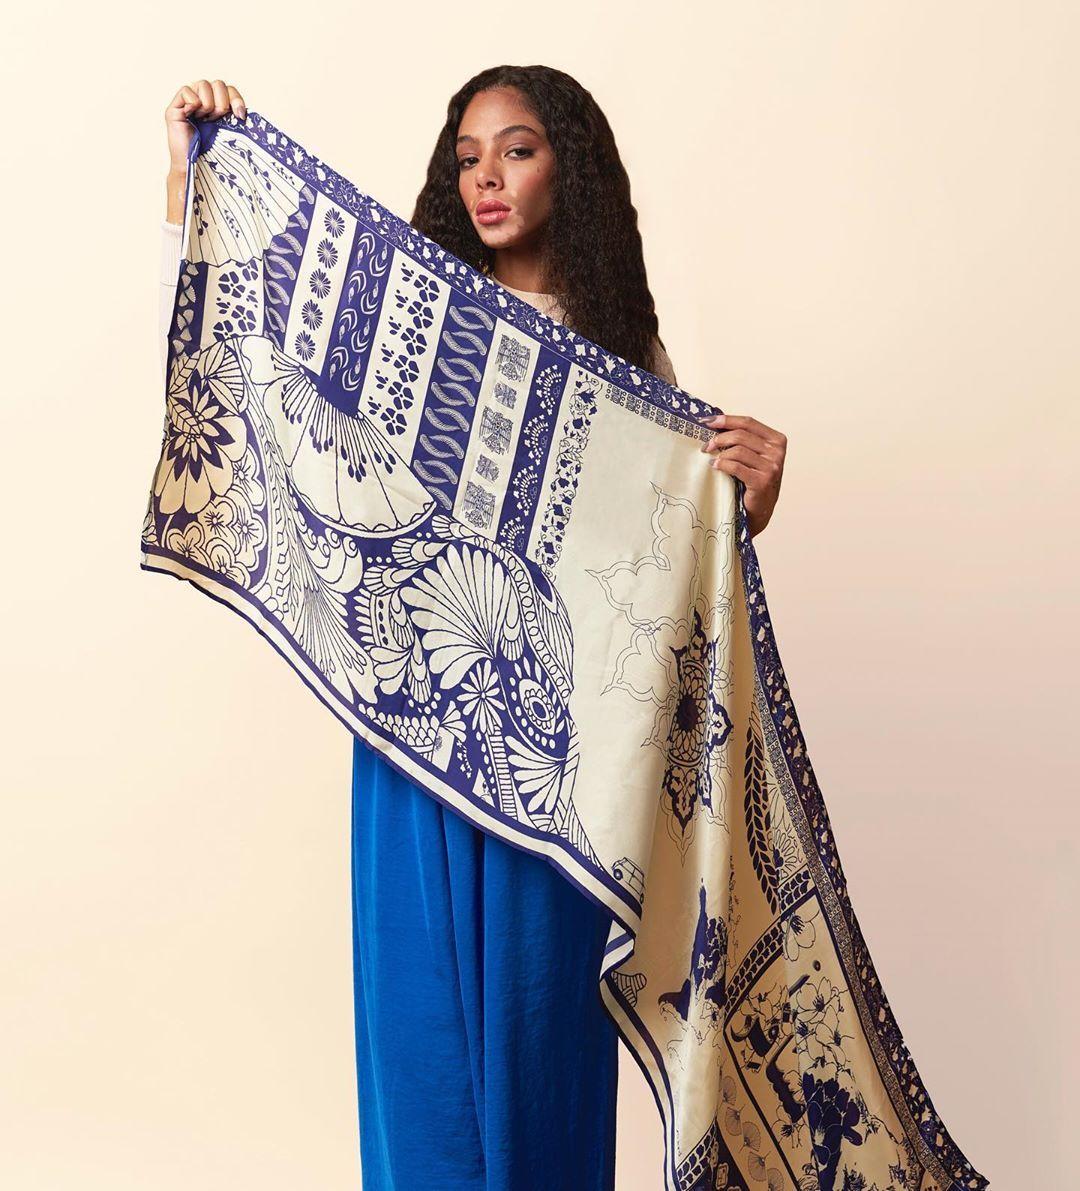 Foulard فولار On Instagram يا مسافر Our Monochrome Lamshaml Scarf Is Available In Silk Cotton Shop Online Www Foulardstore Fashion Saree Scarf